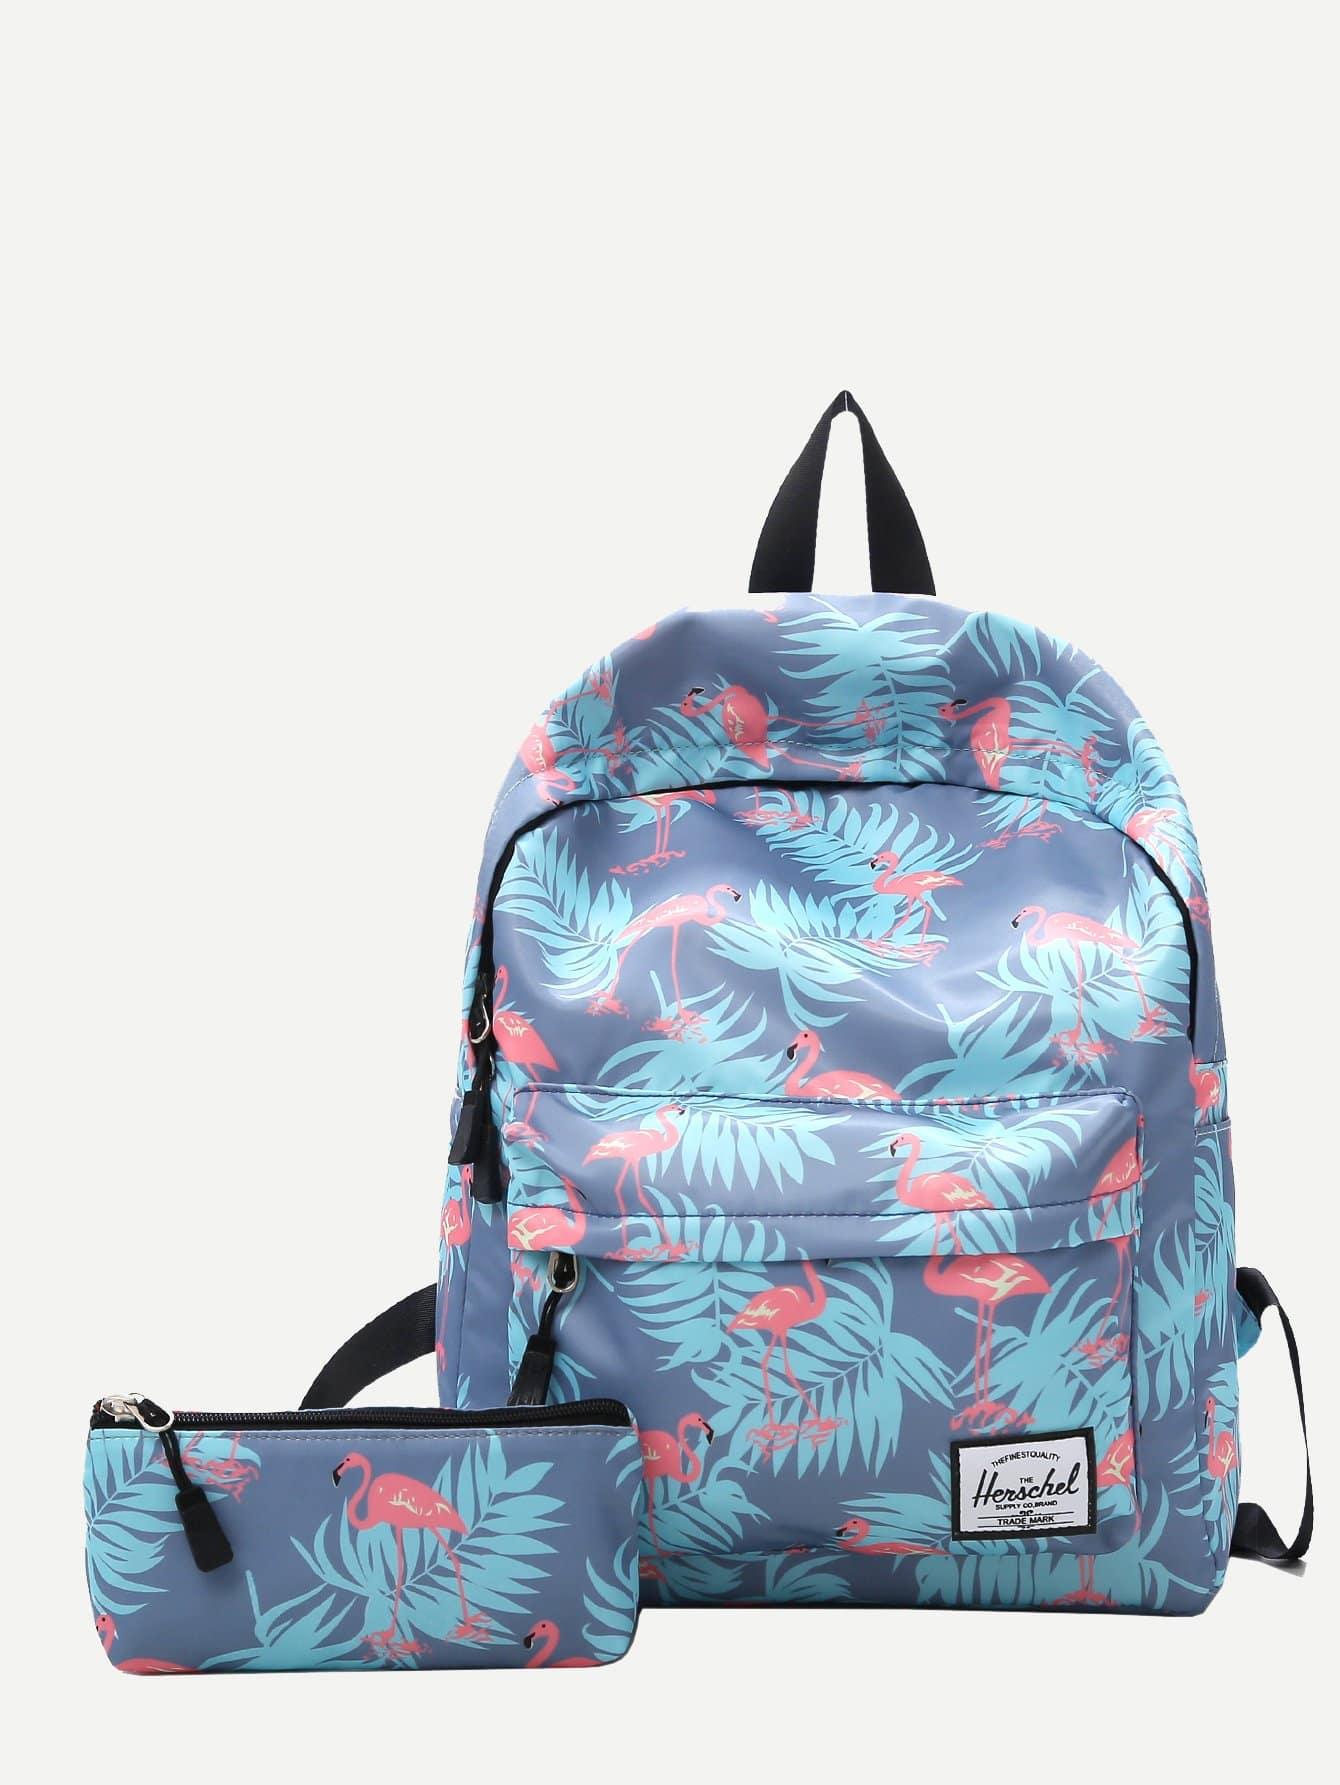 Рюкзак с рисунками фламинг и Clutch сумка